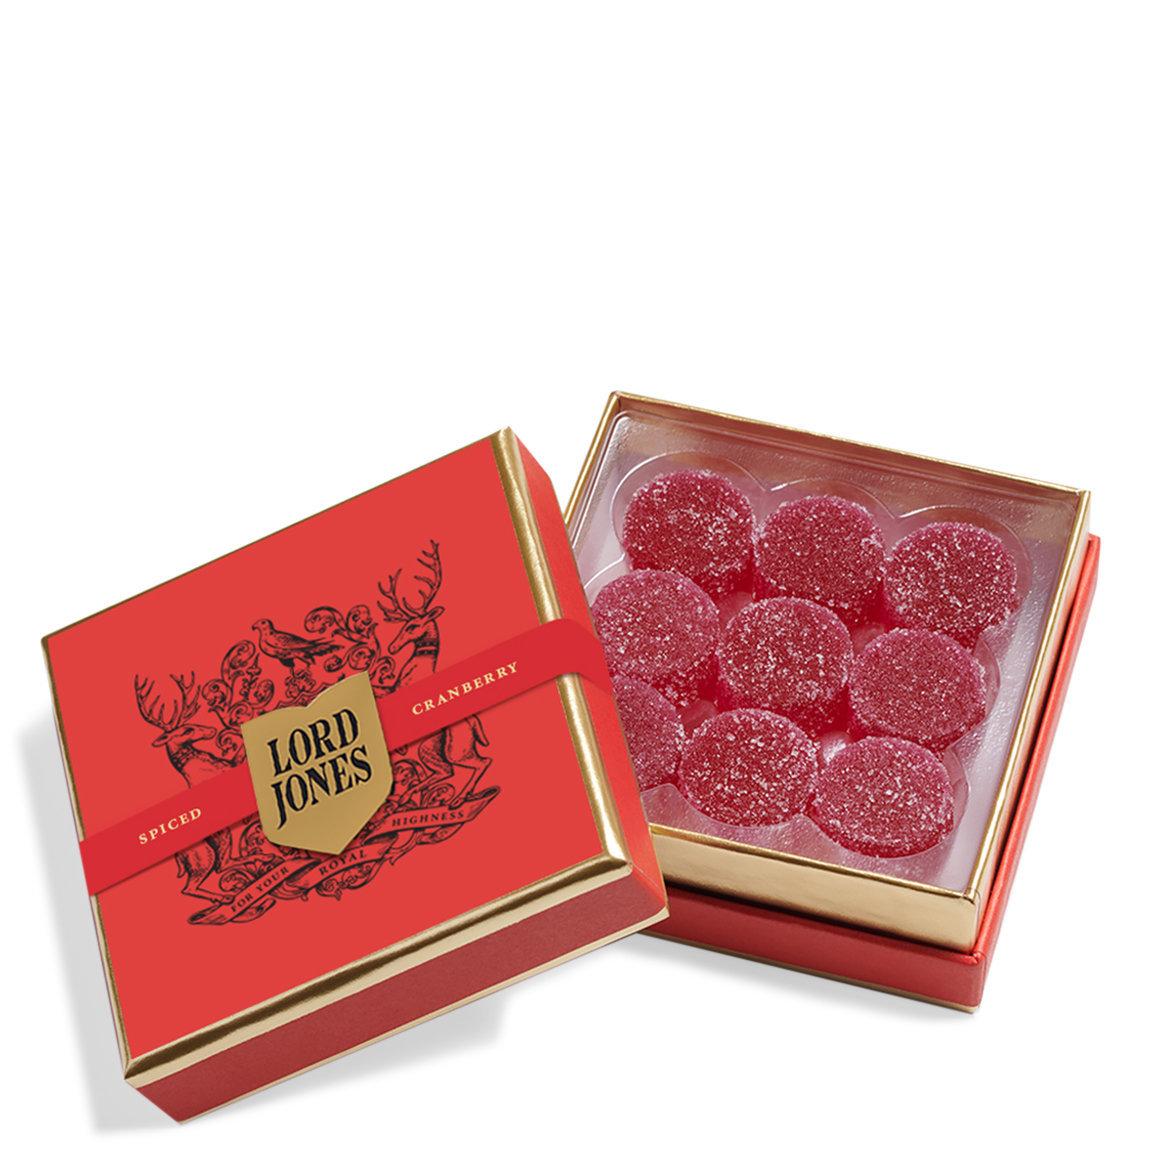 Lord Jones Old Fashioned Hemp-Derived CBD Gumdrops Spiced Cranberry alternative view 1 - product swatch.